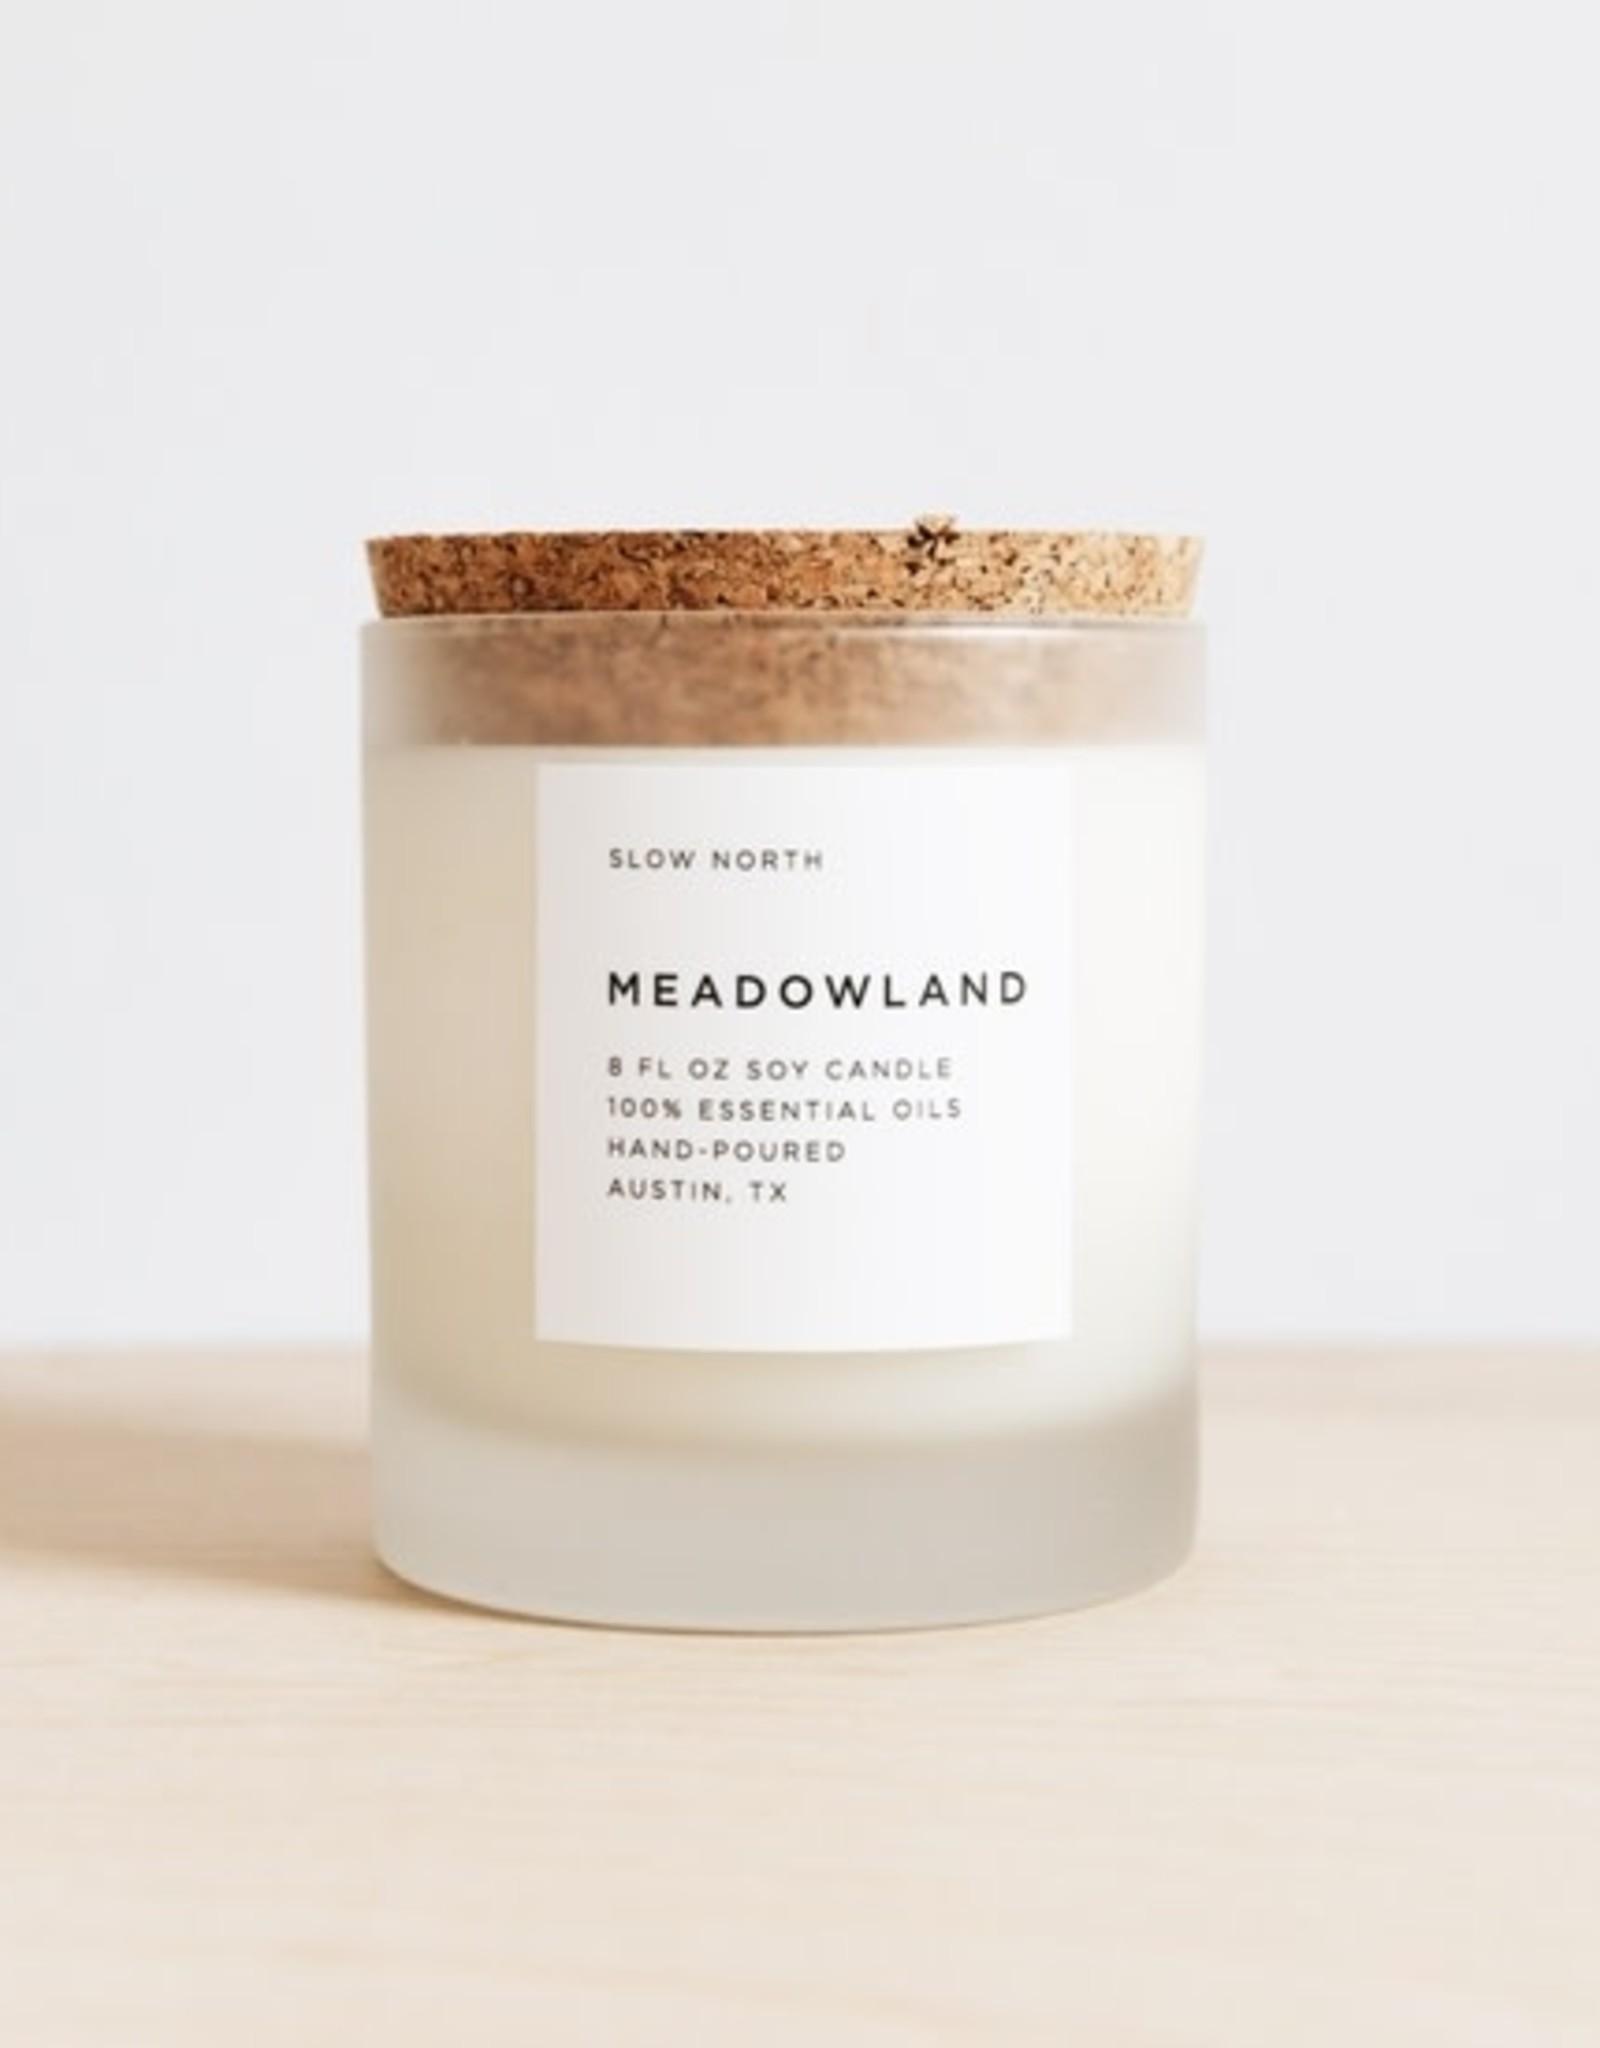 Slow North Meadowland